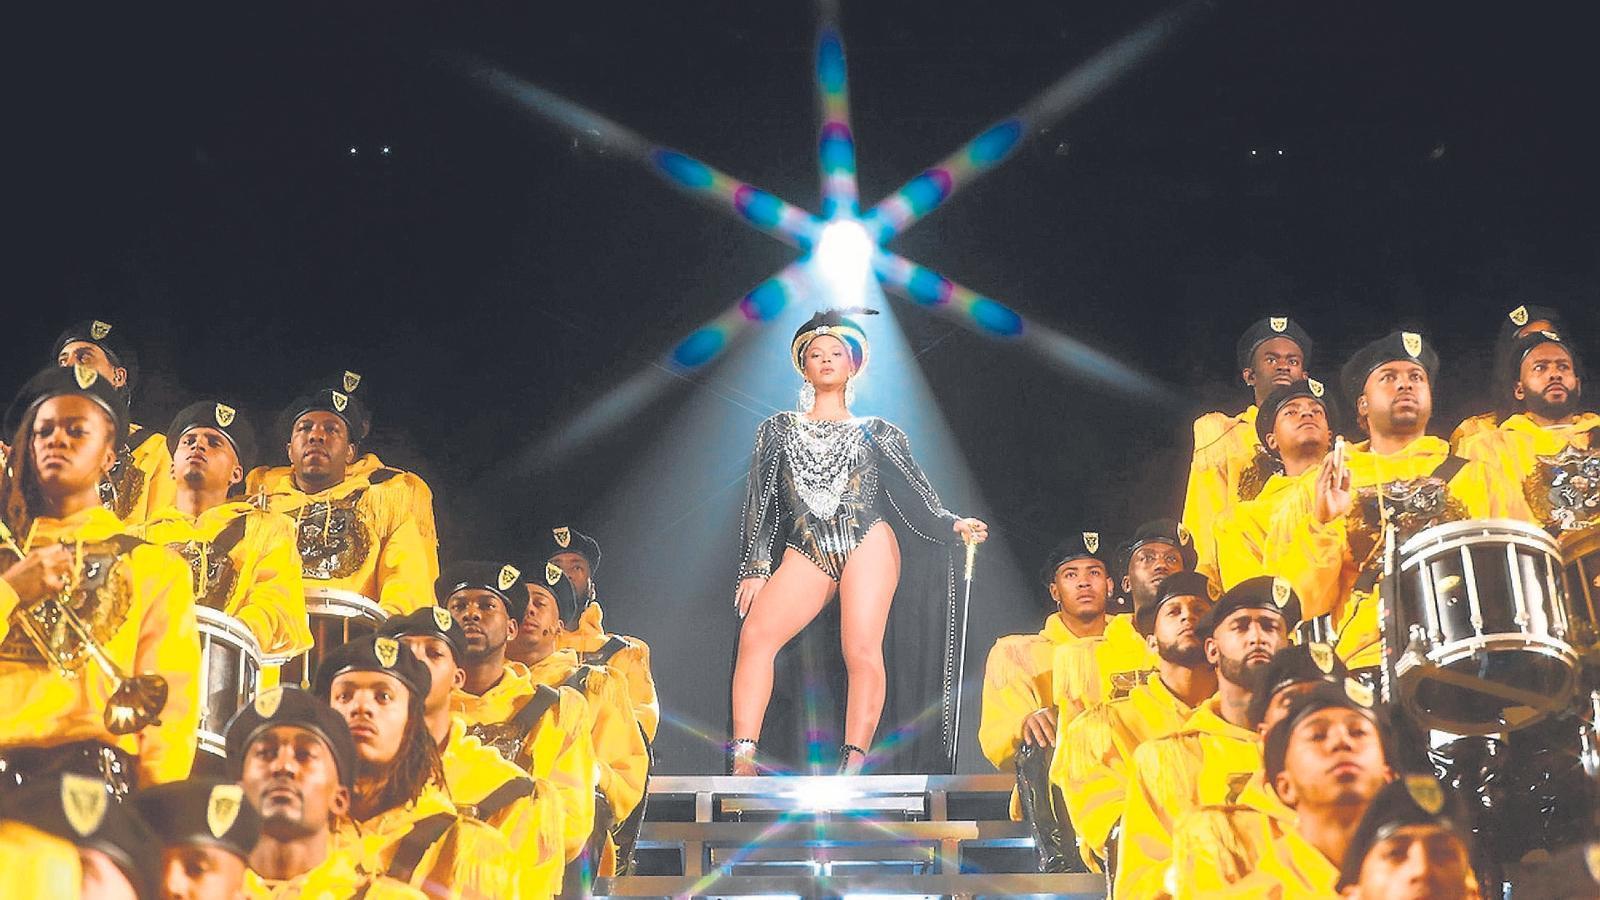 Beyoncé al Festival Coachella de 2018.